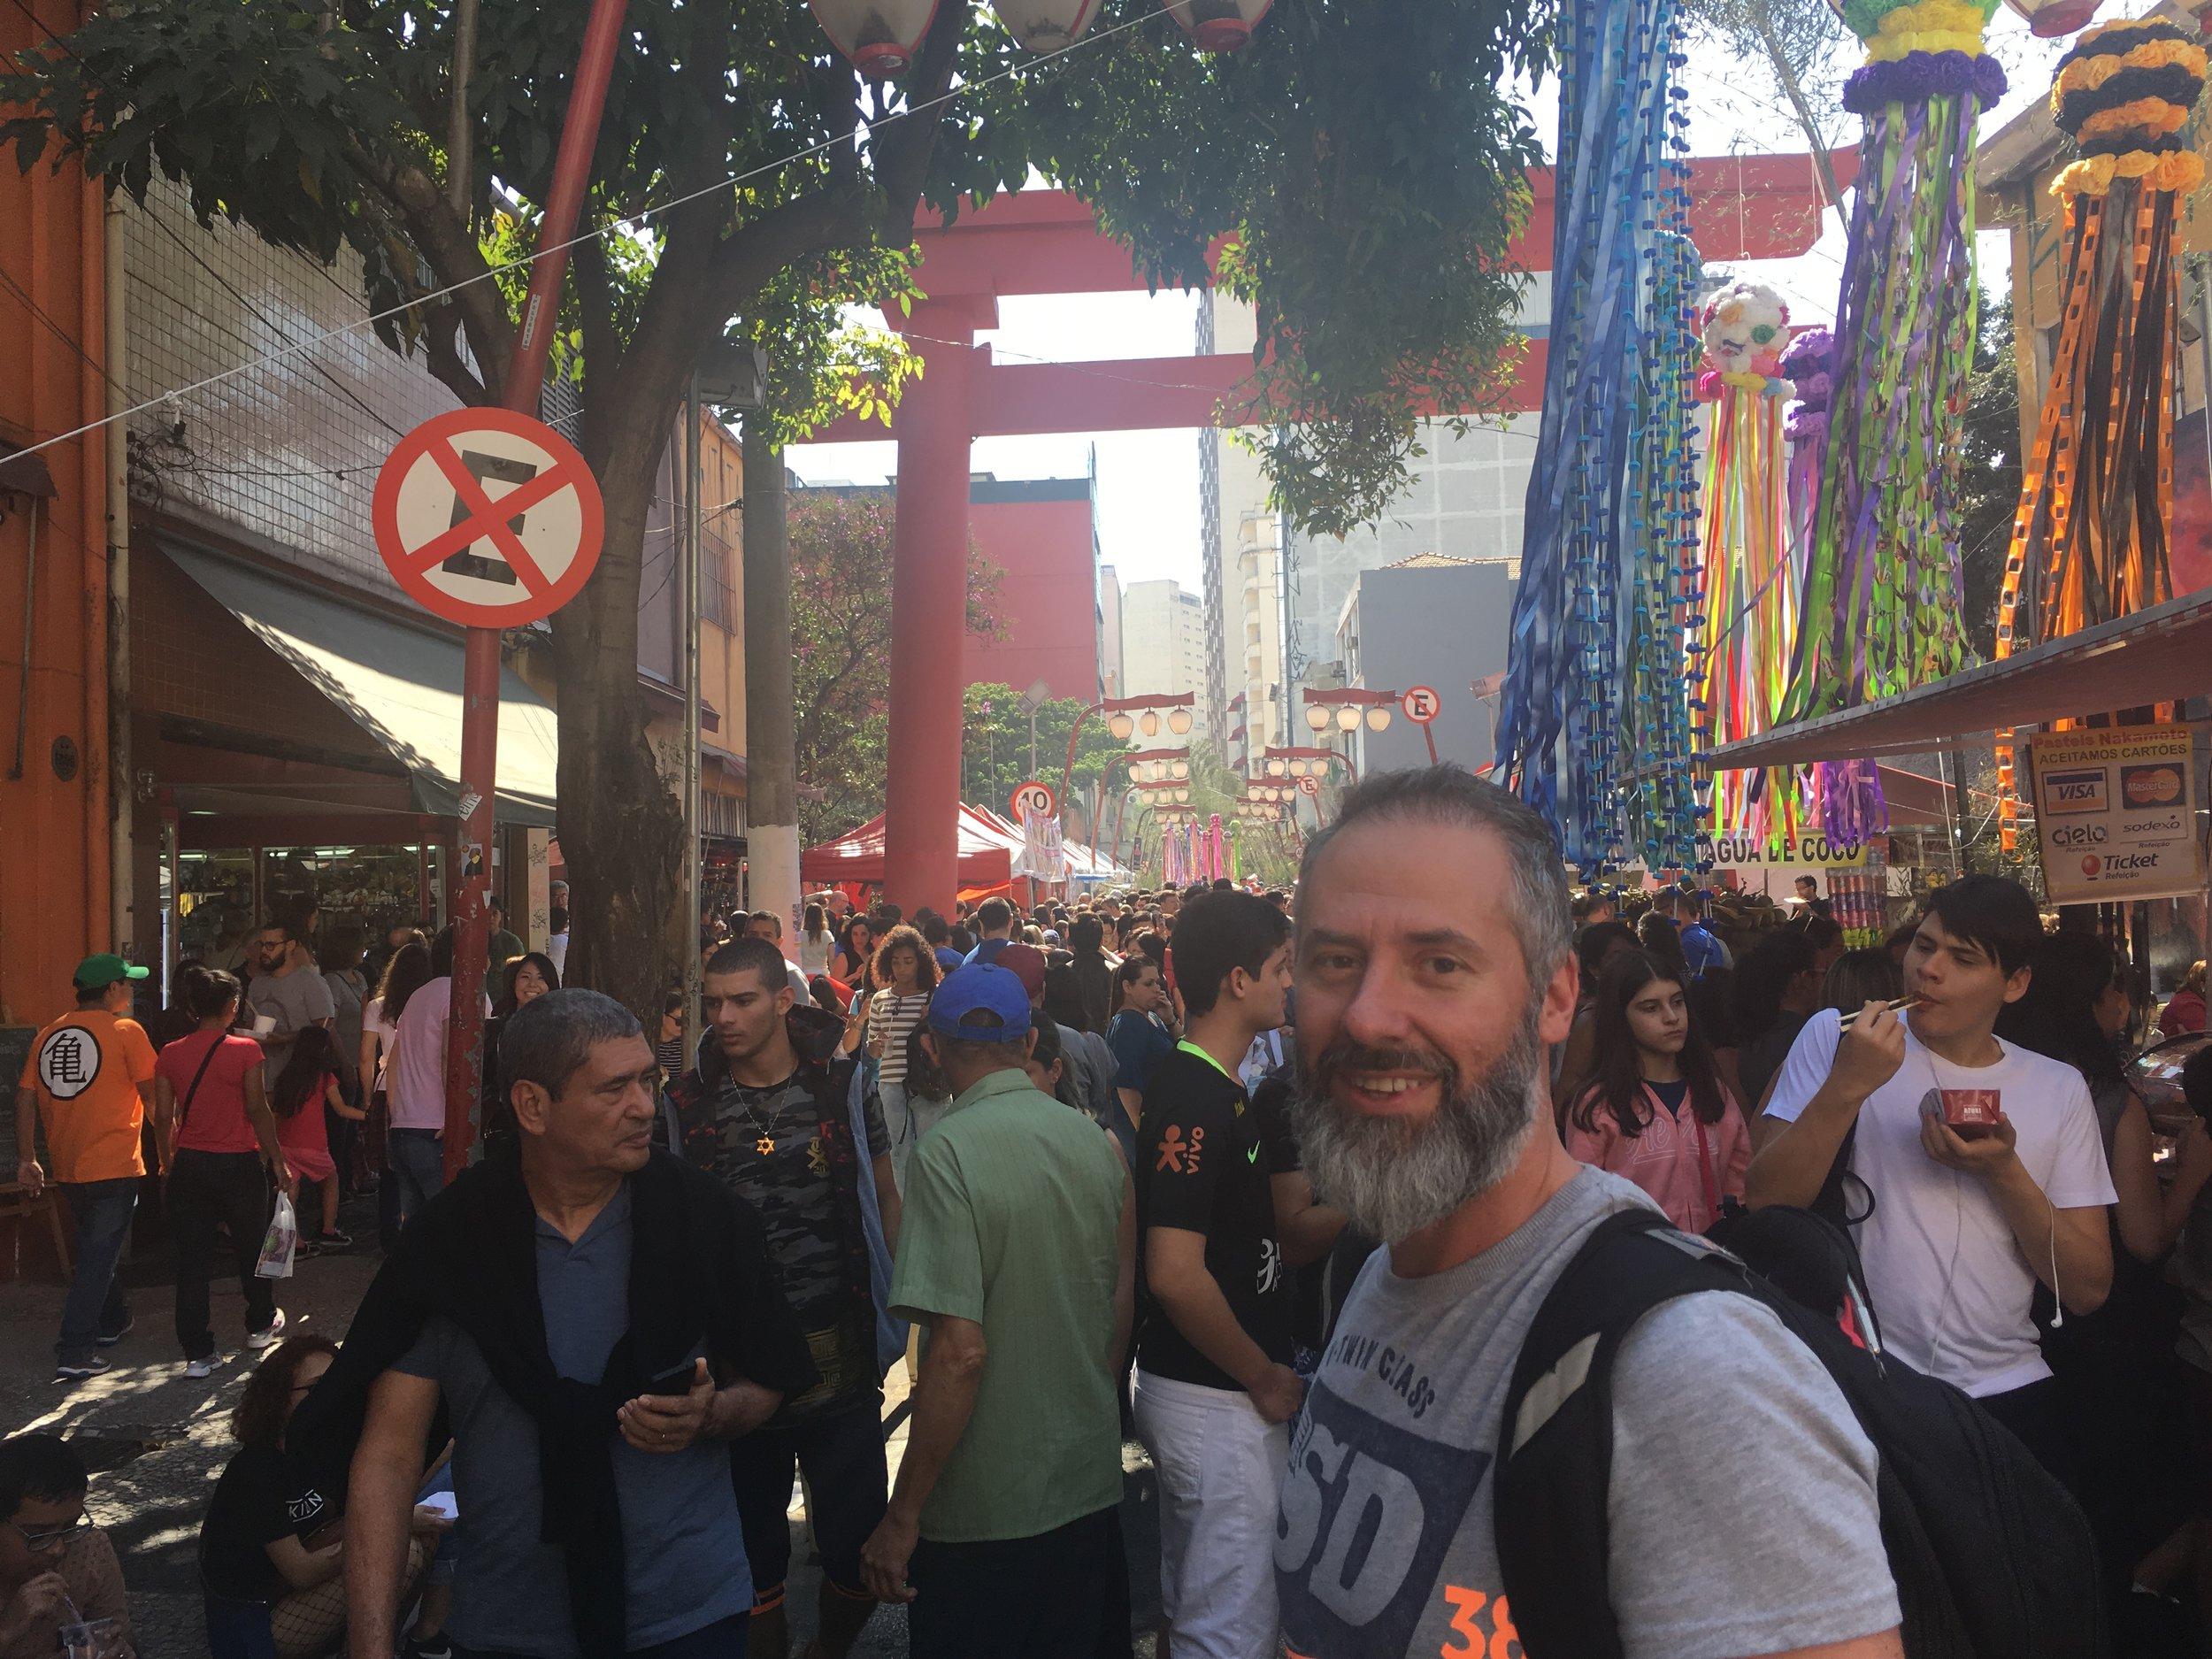 Street fair in Liberdade